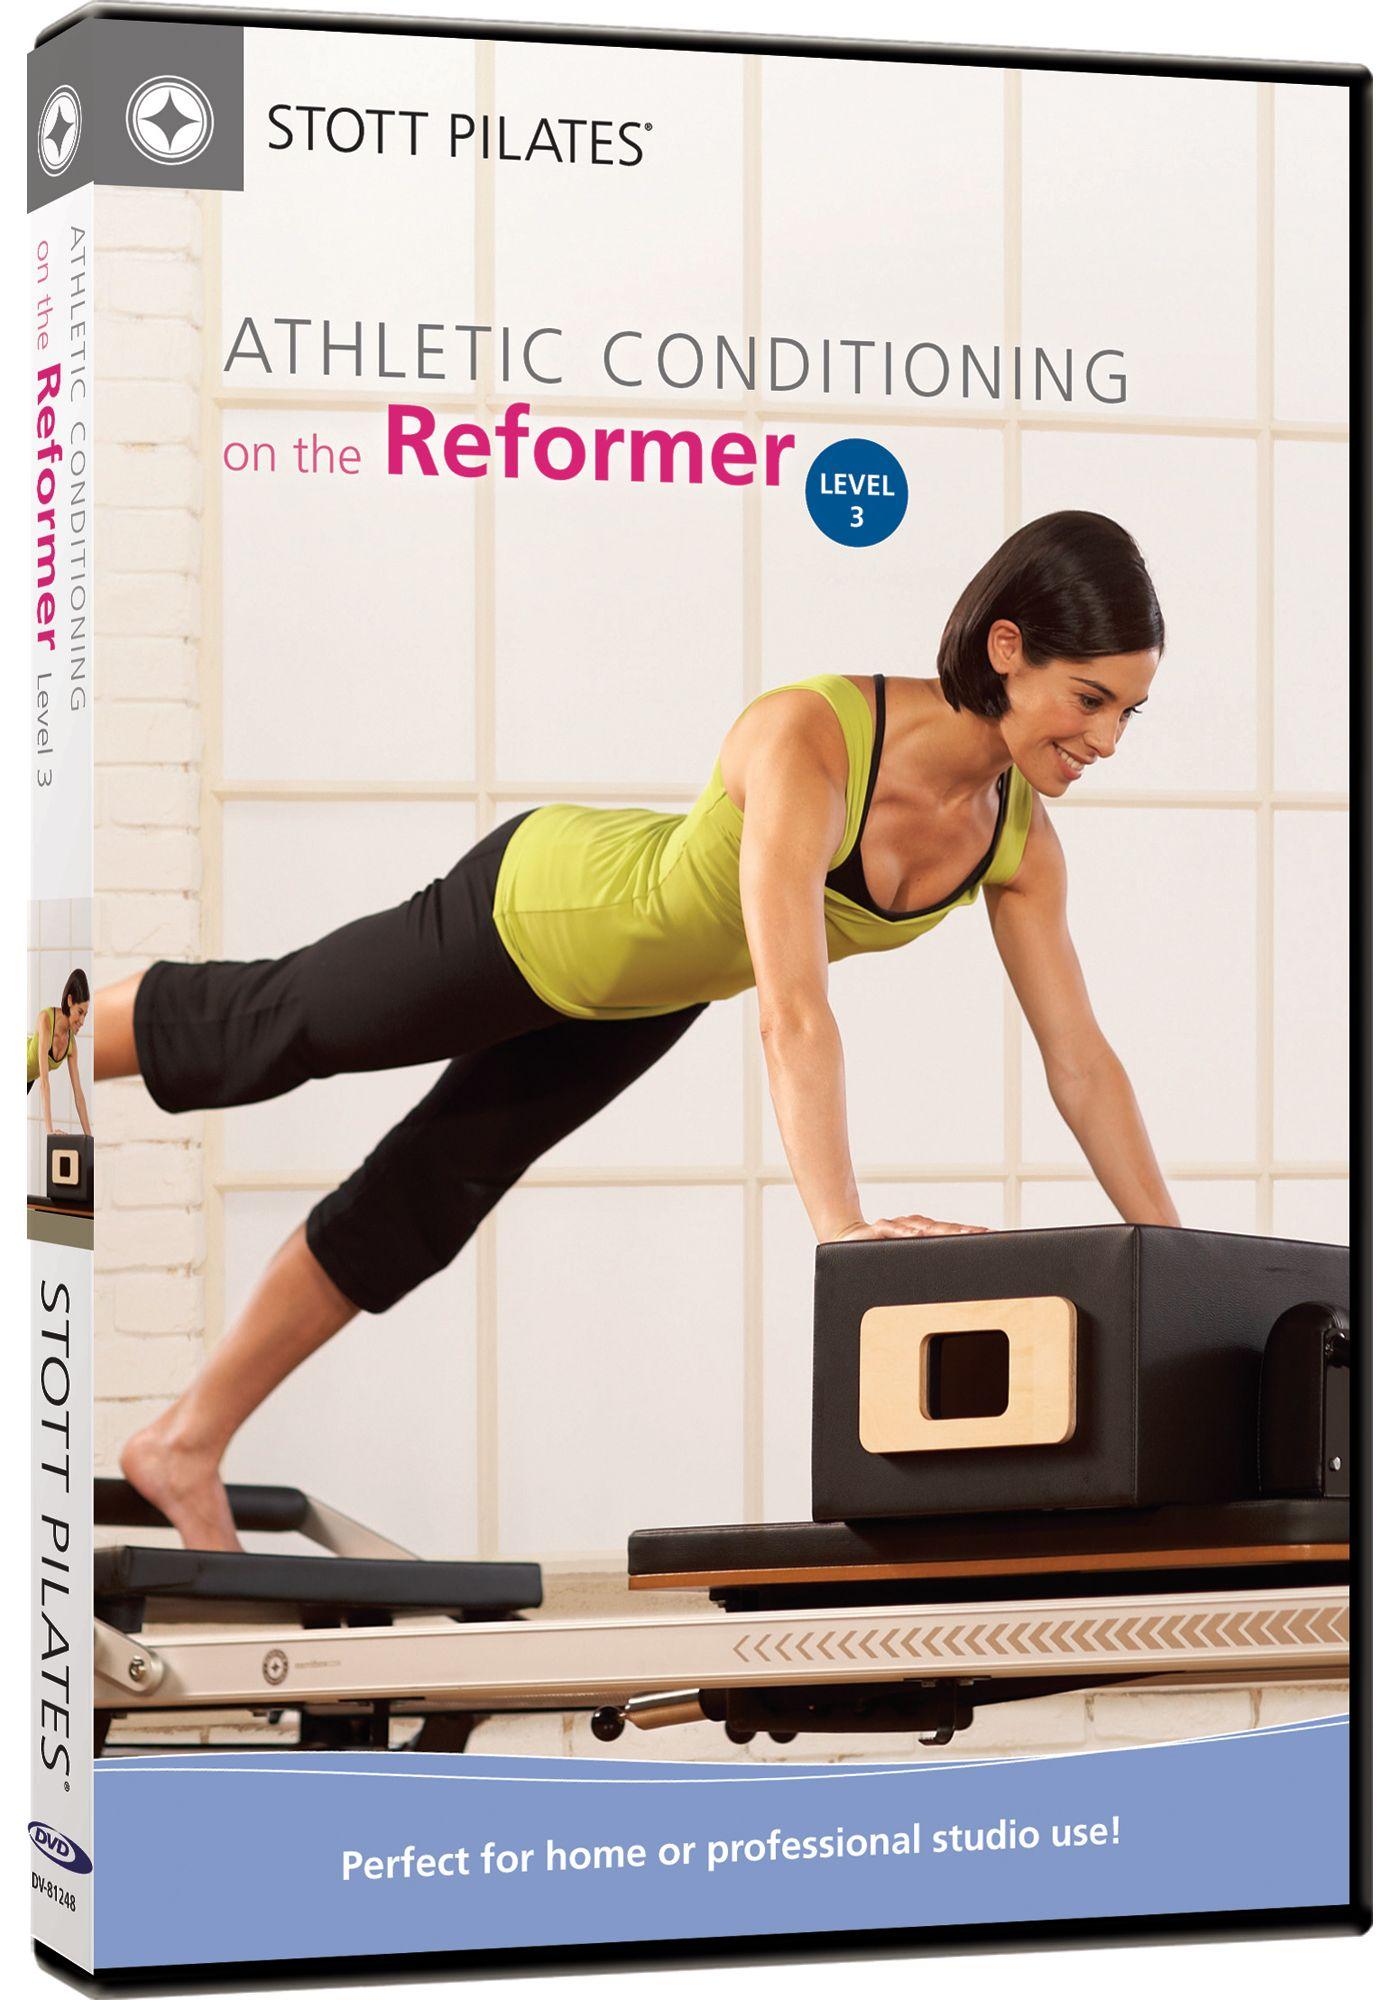 STOTT PILATES Athletic Conditioning Reform Level 3 DVD